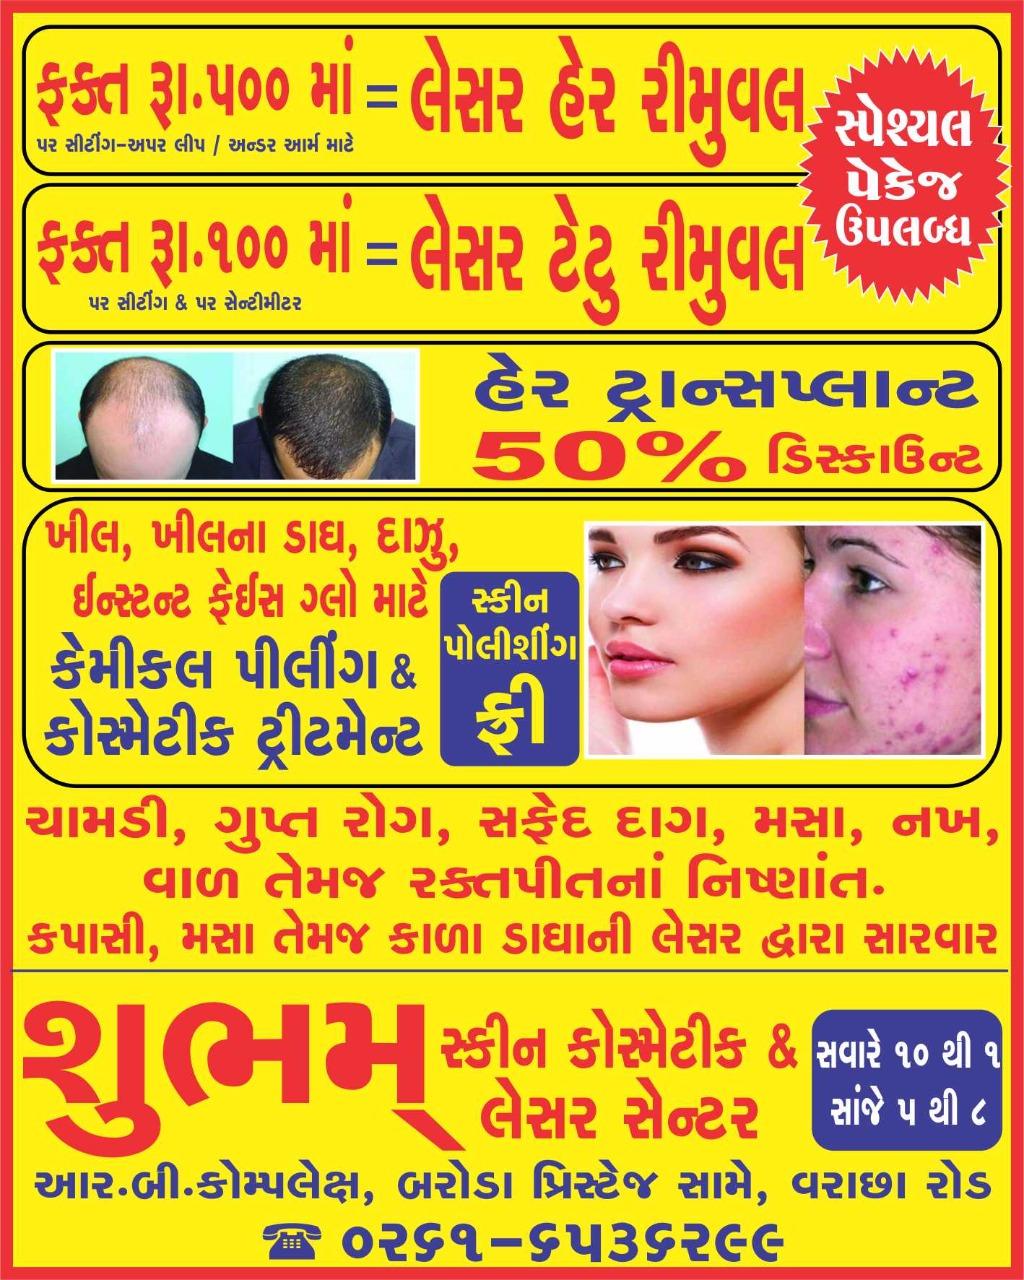 Top 10 Laser Treatment for Skin in Surat, Laser Skin